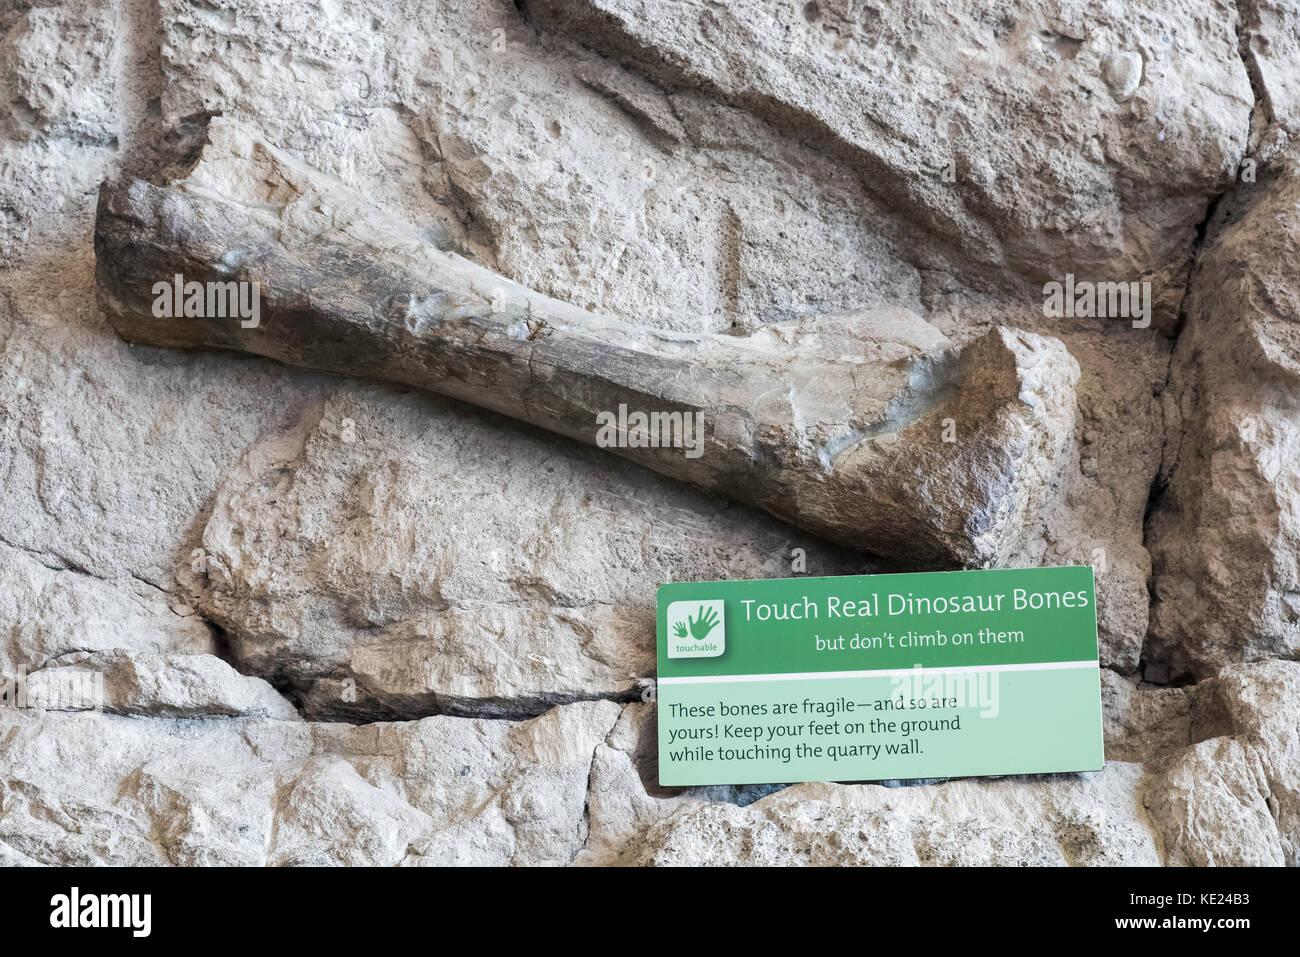 Dinosaur Bone on Display, Dinosaur Quarry Exhibit, Dinosaur National Monument, Utah, USA - Stock Image